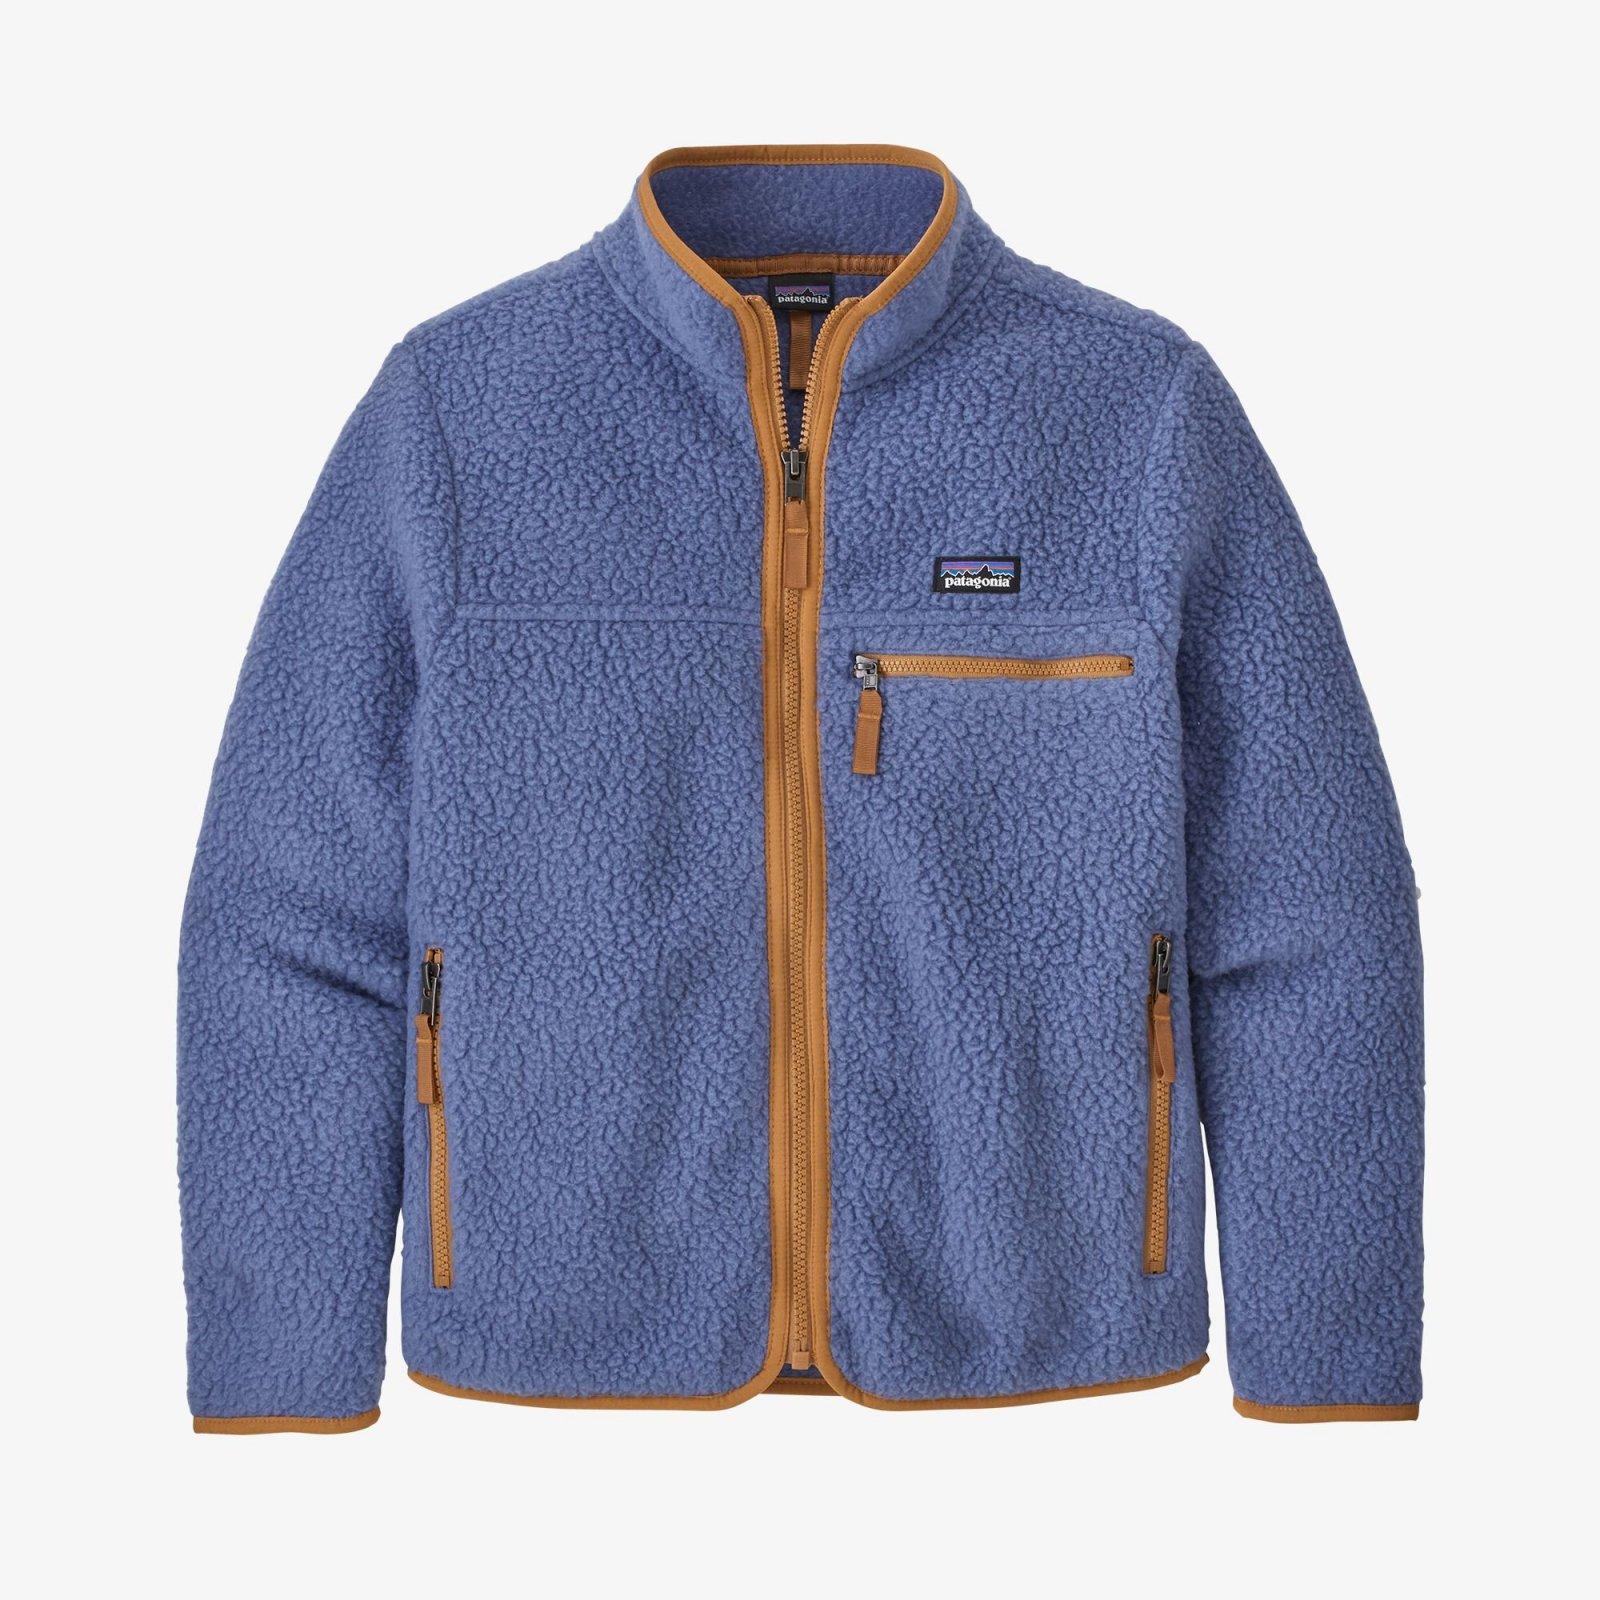 Patagonia Girls Retro Pile Jacket - Current Blue